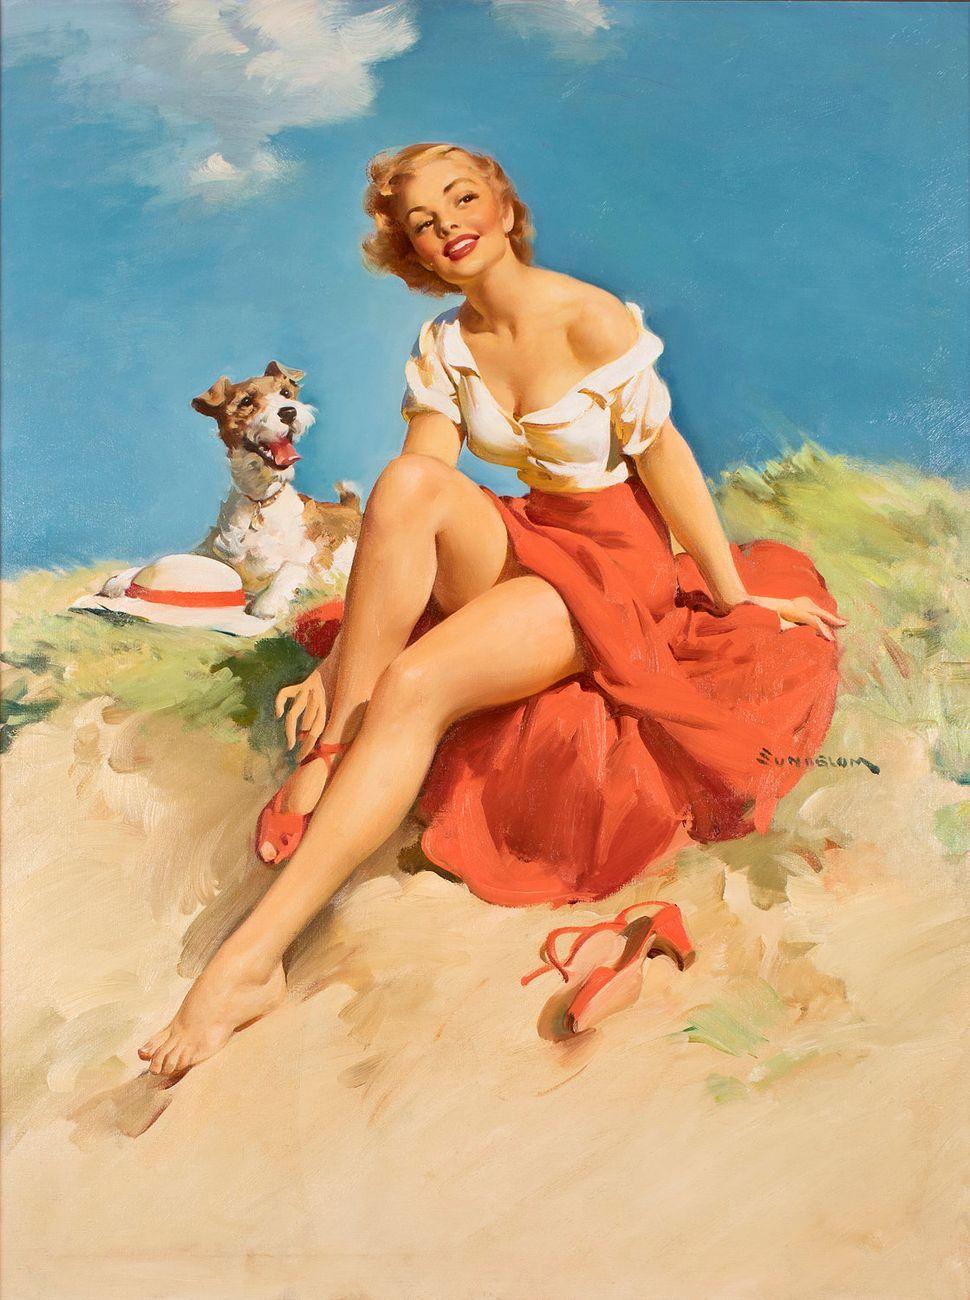 Haddon Sundblom, Untitled (Girl with Dog) (40x30 Oil on Canvas)